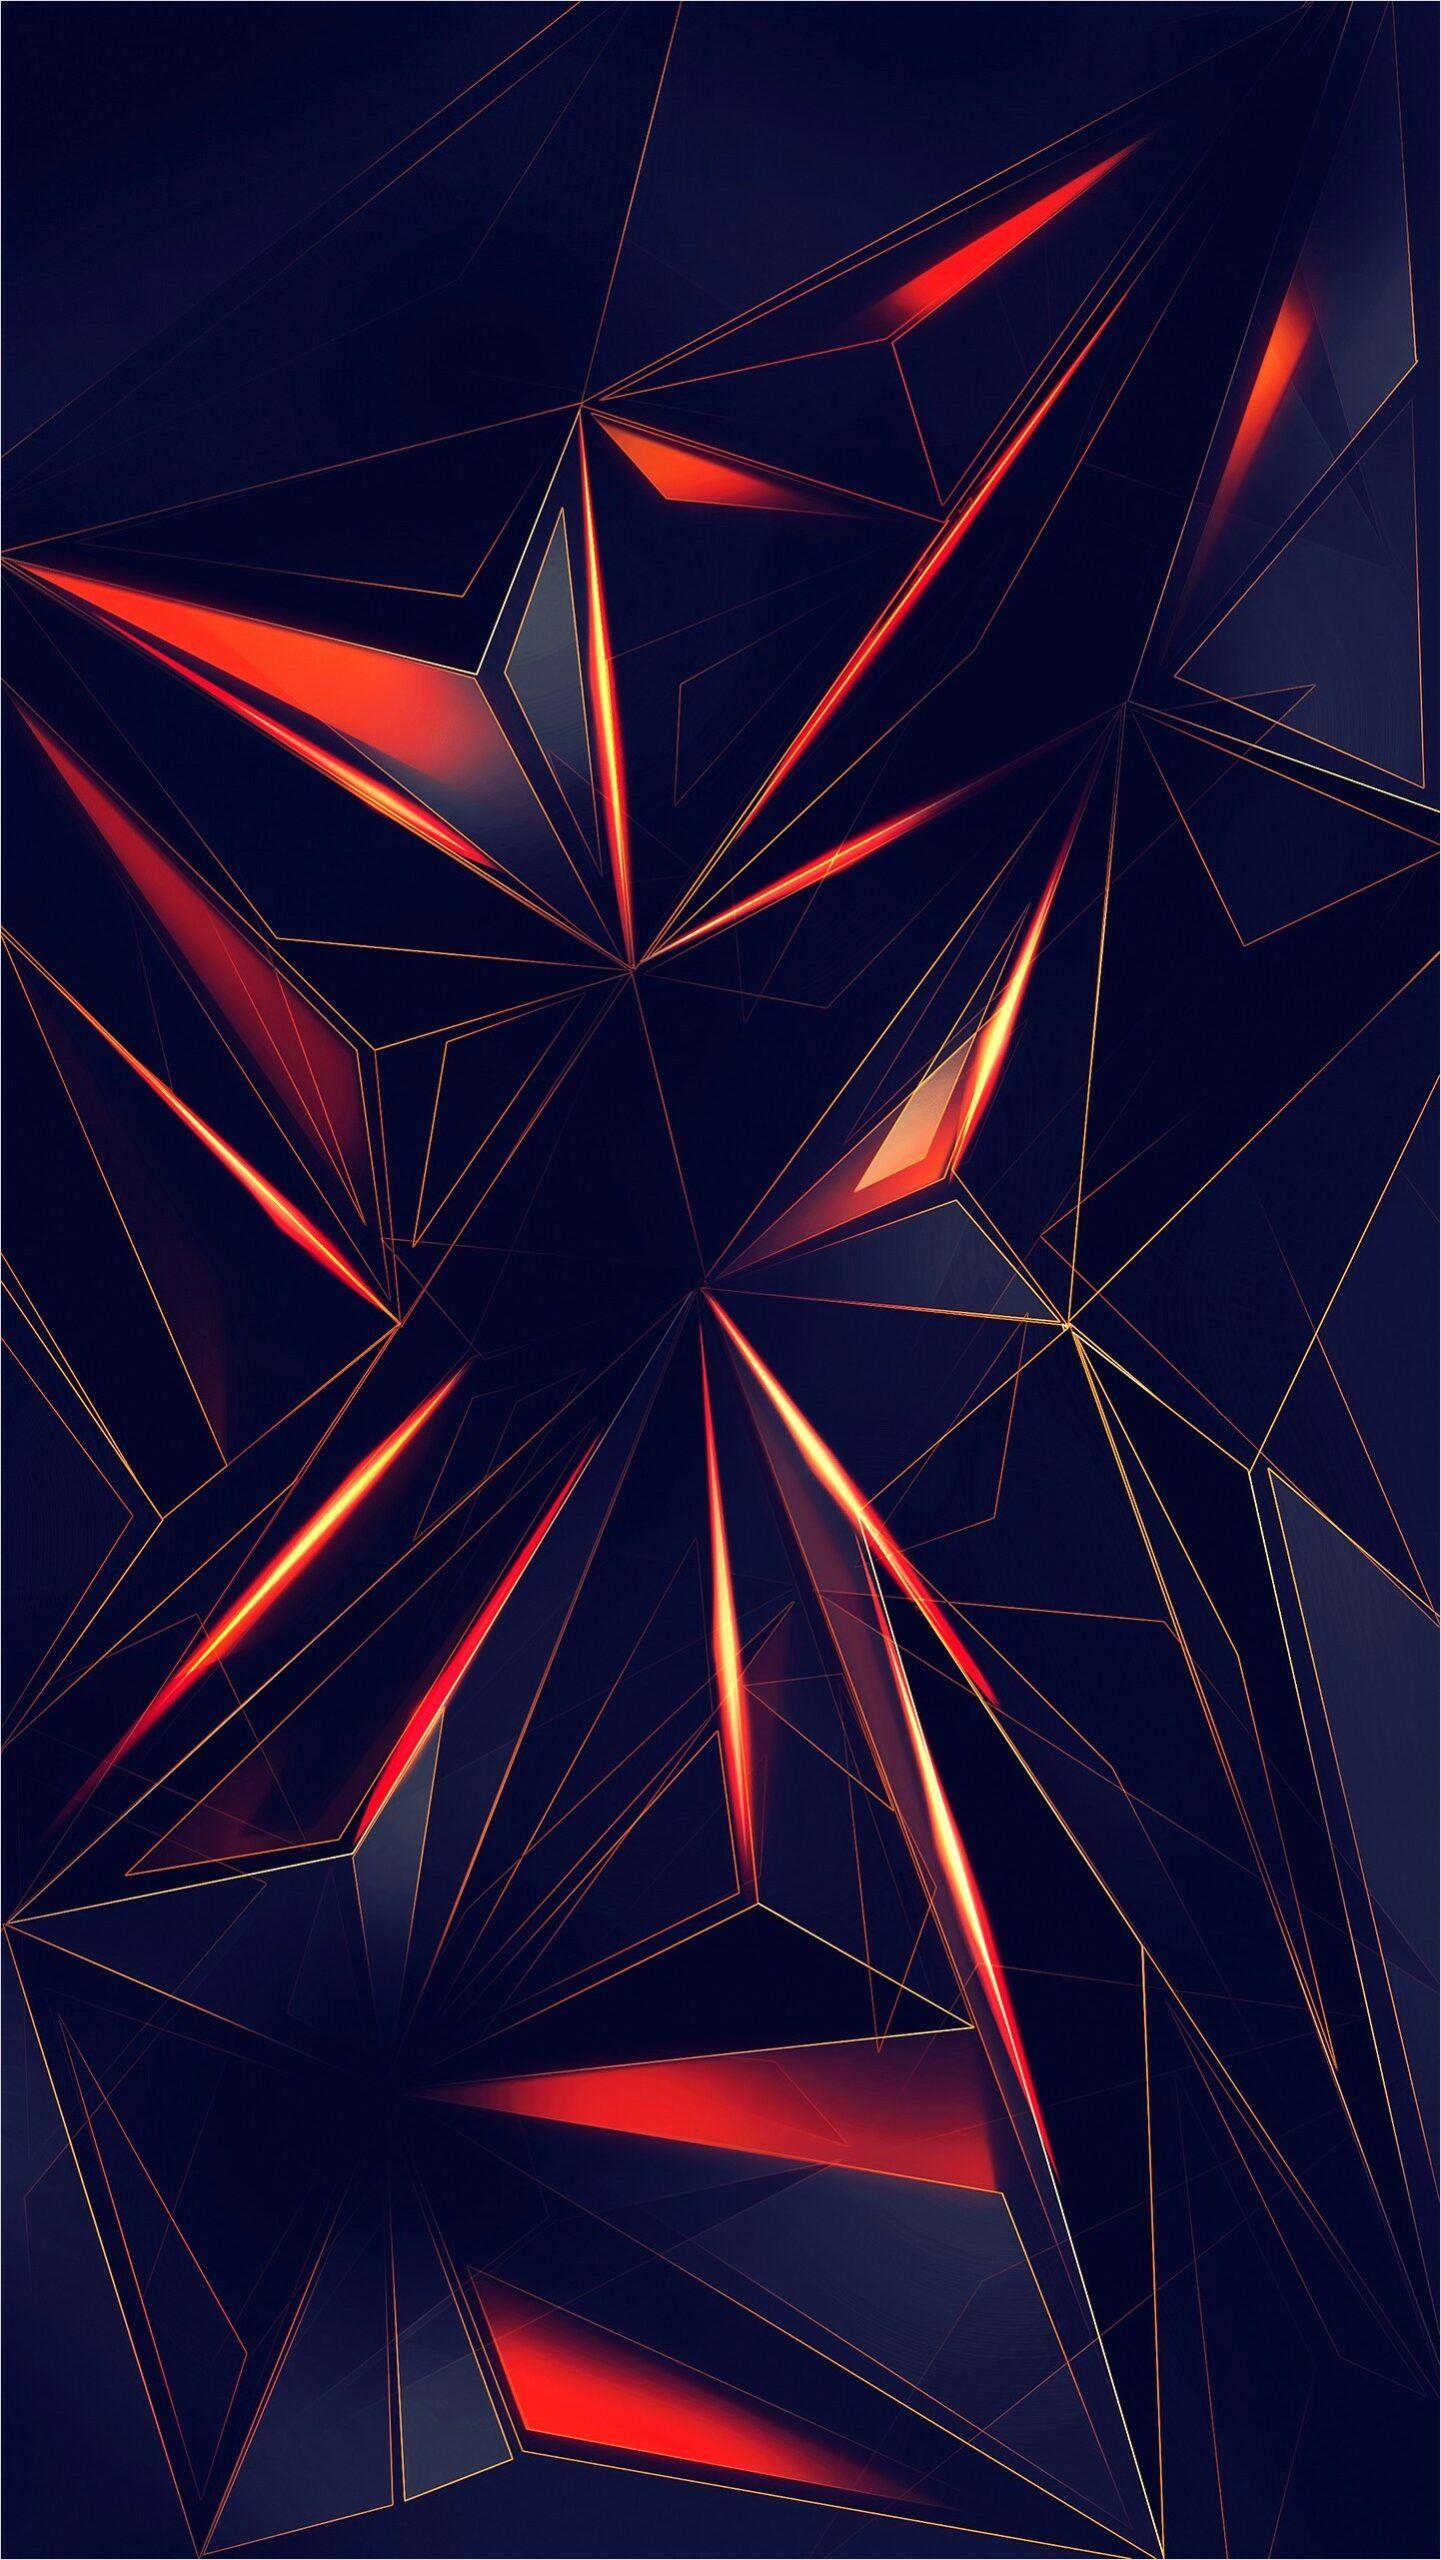 3d Geometric Wallpapers 4k Geometric Wallpaper 4k Geometric Wallpaper 3d Wallpaper